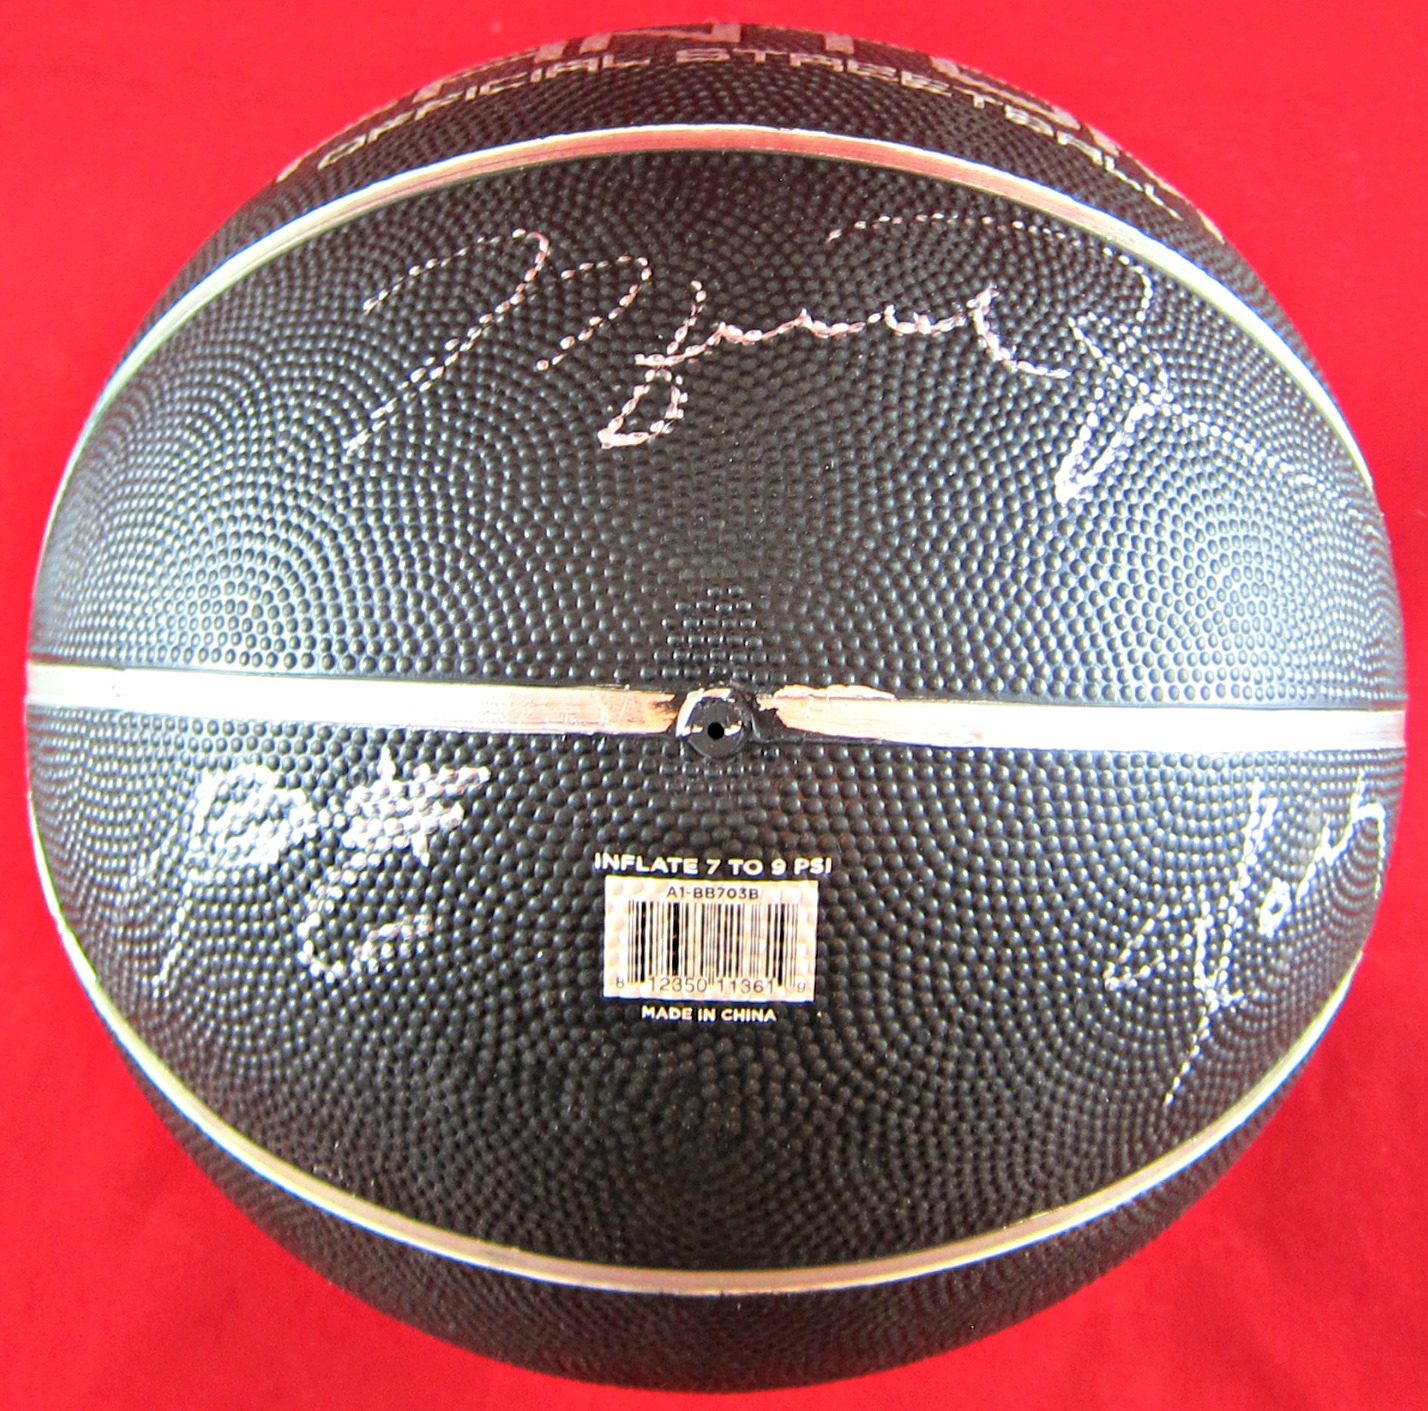 the latest a6474 d6793 Michael Jordan, LeBron James, & Kobe Bryant Autographed Basketball